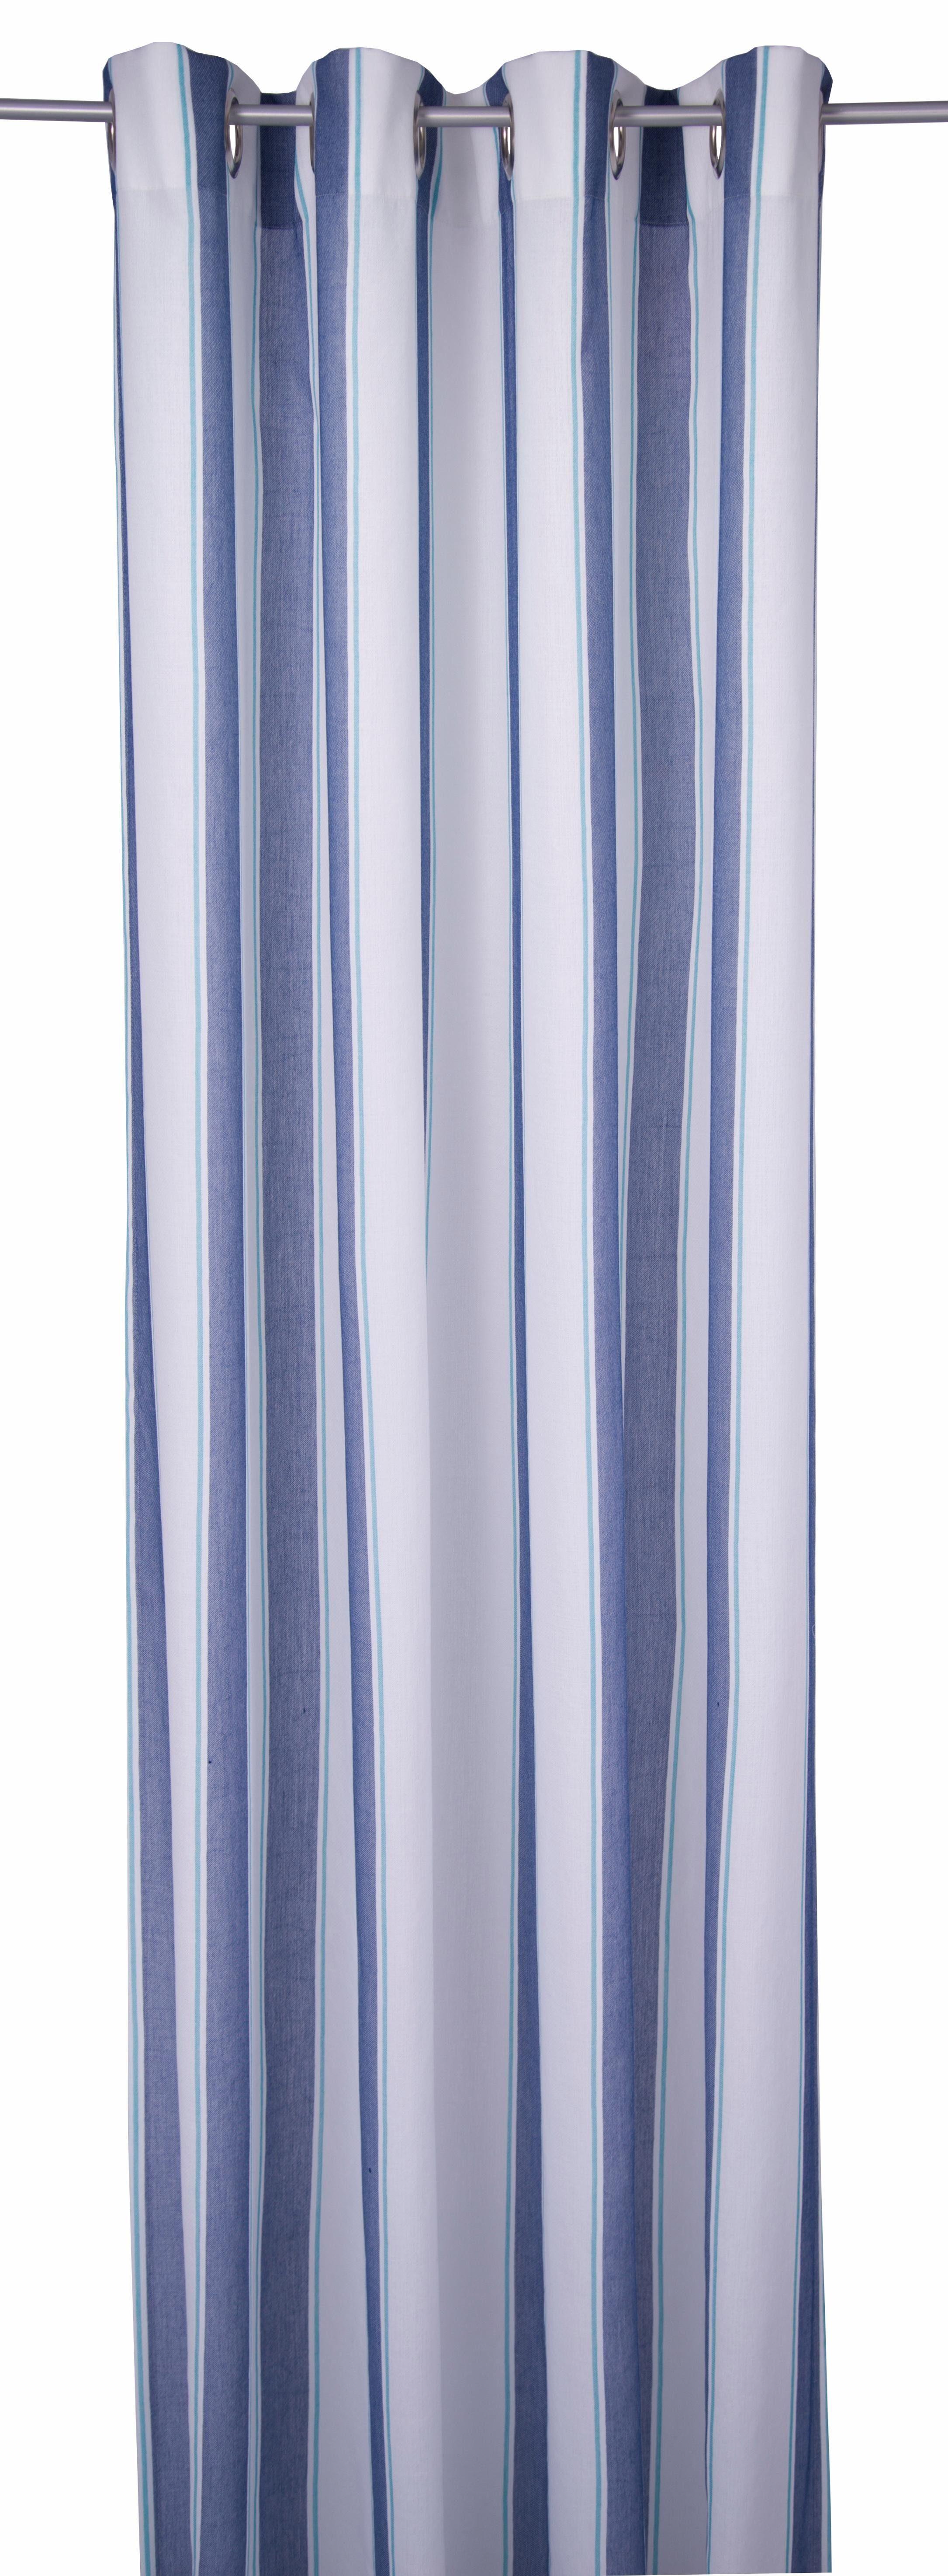 Vorhang »CASUAL CLOTH«, TOM TAILOR, Ösen (1 Stück)